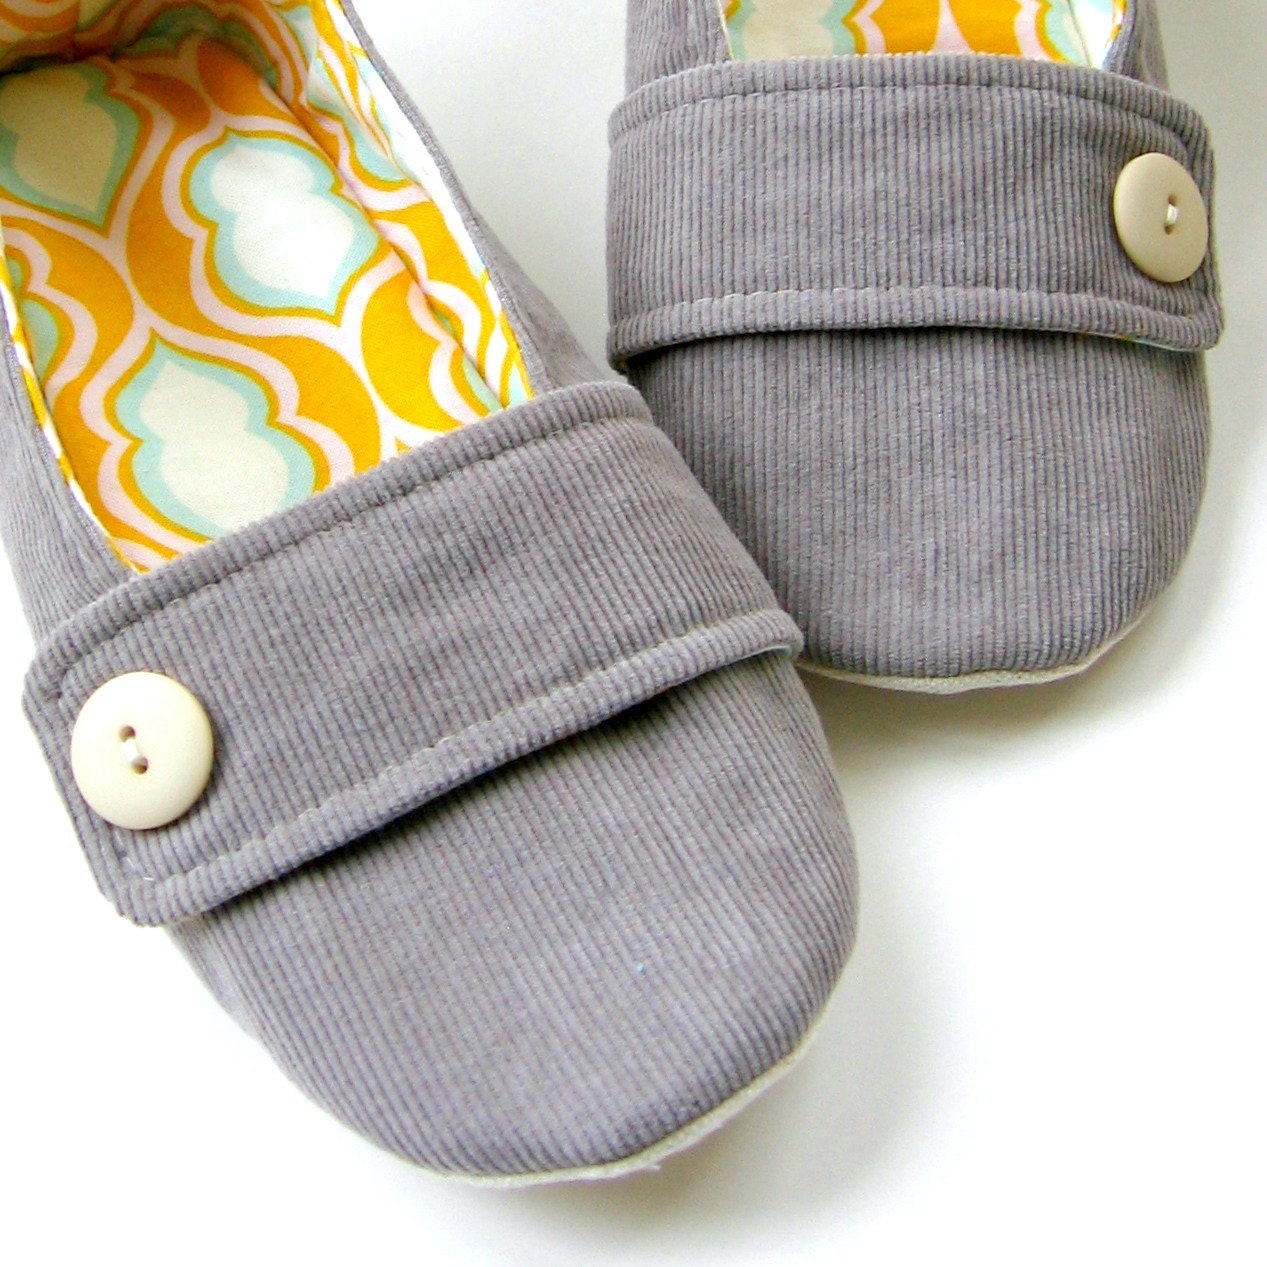 Women's Slippers - Grey Corduroy, Tangerine Yellow and Aqua 'Moli-Maude' House Slippers - Molipop